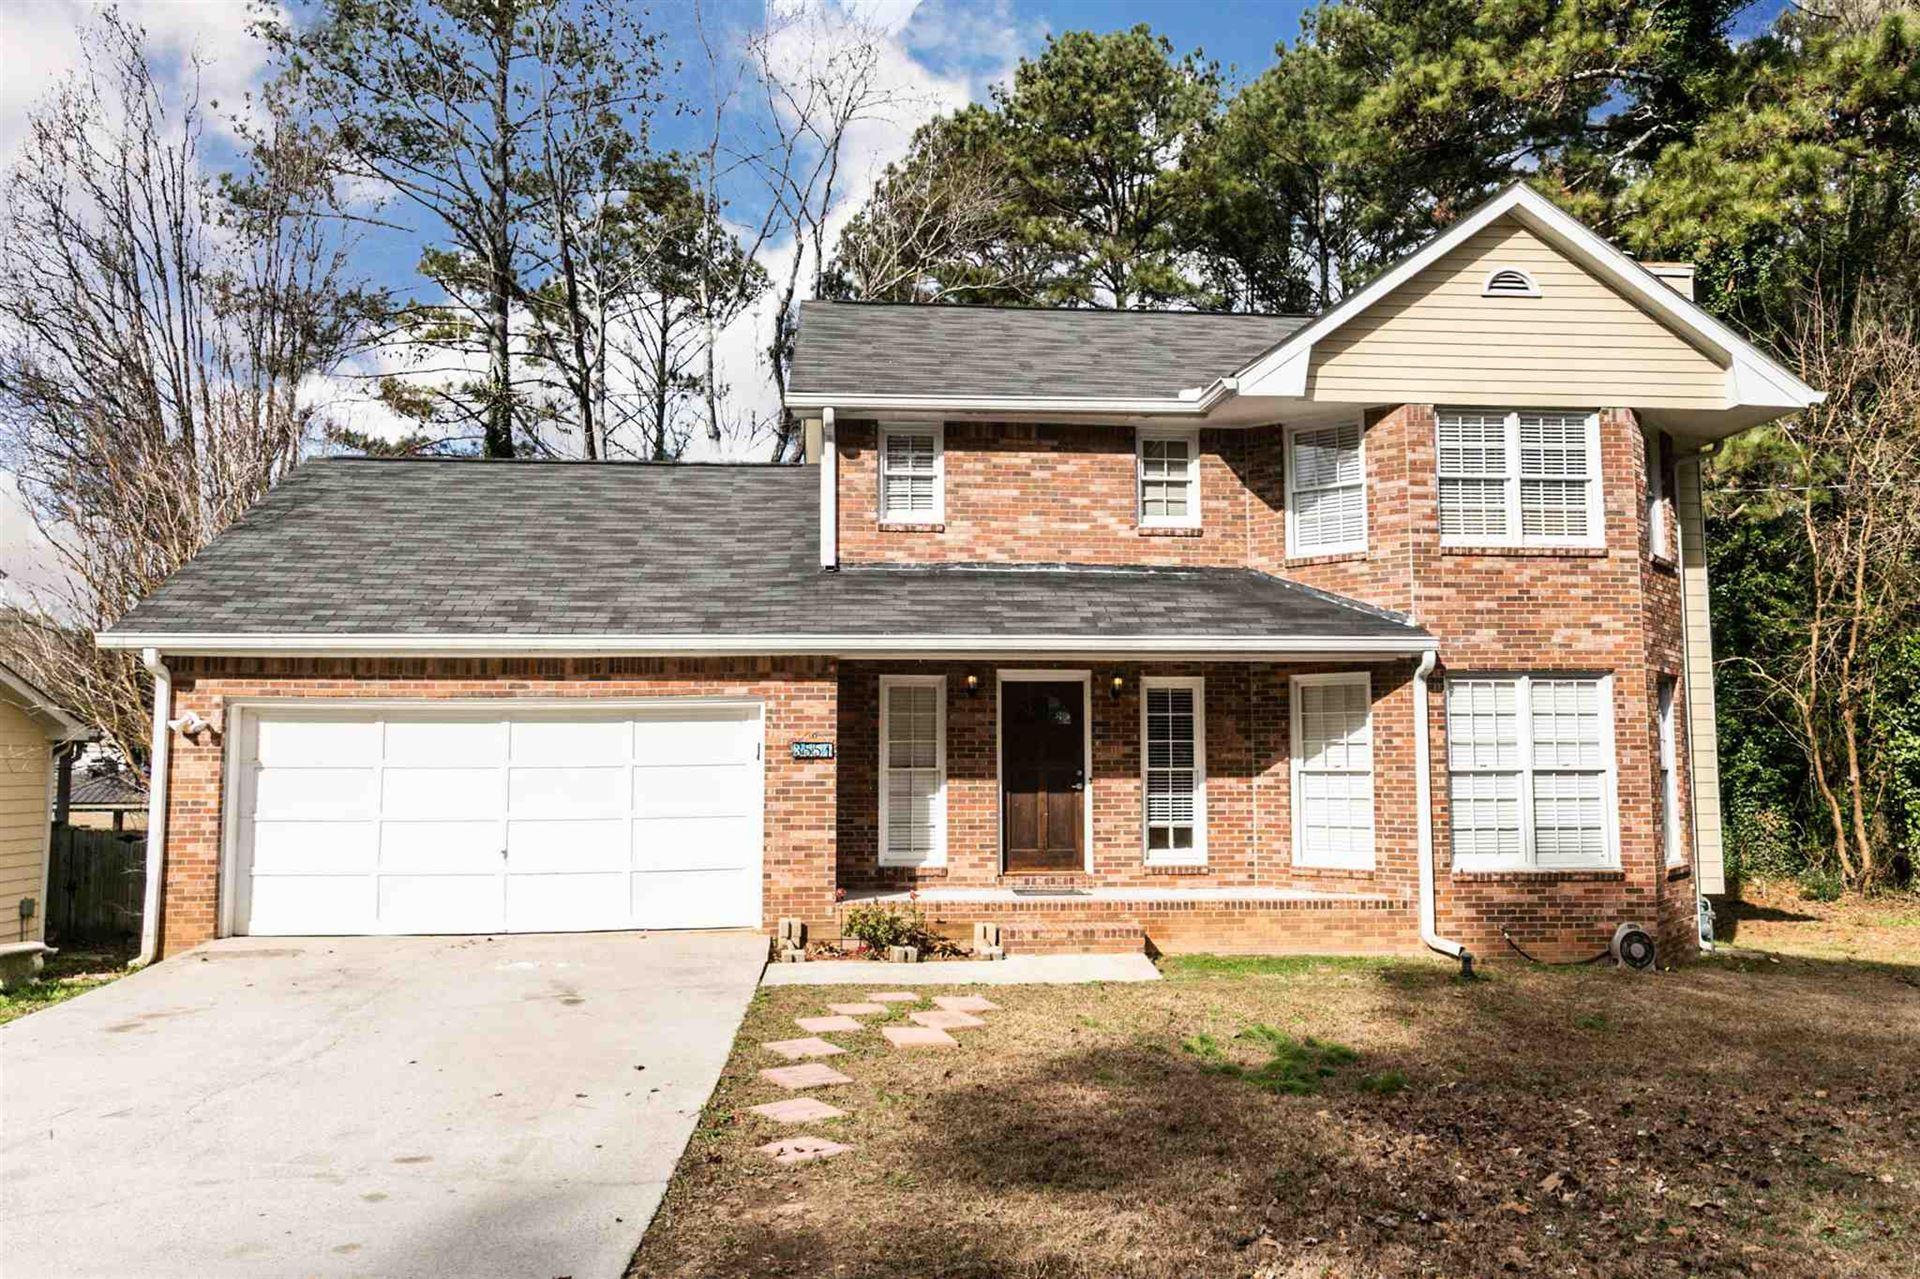 3551 Birchwood Trl, Snellville, GA 30078 - MLS#: 8910423